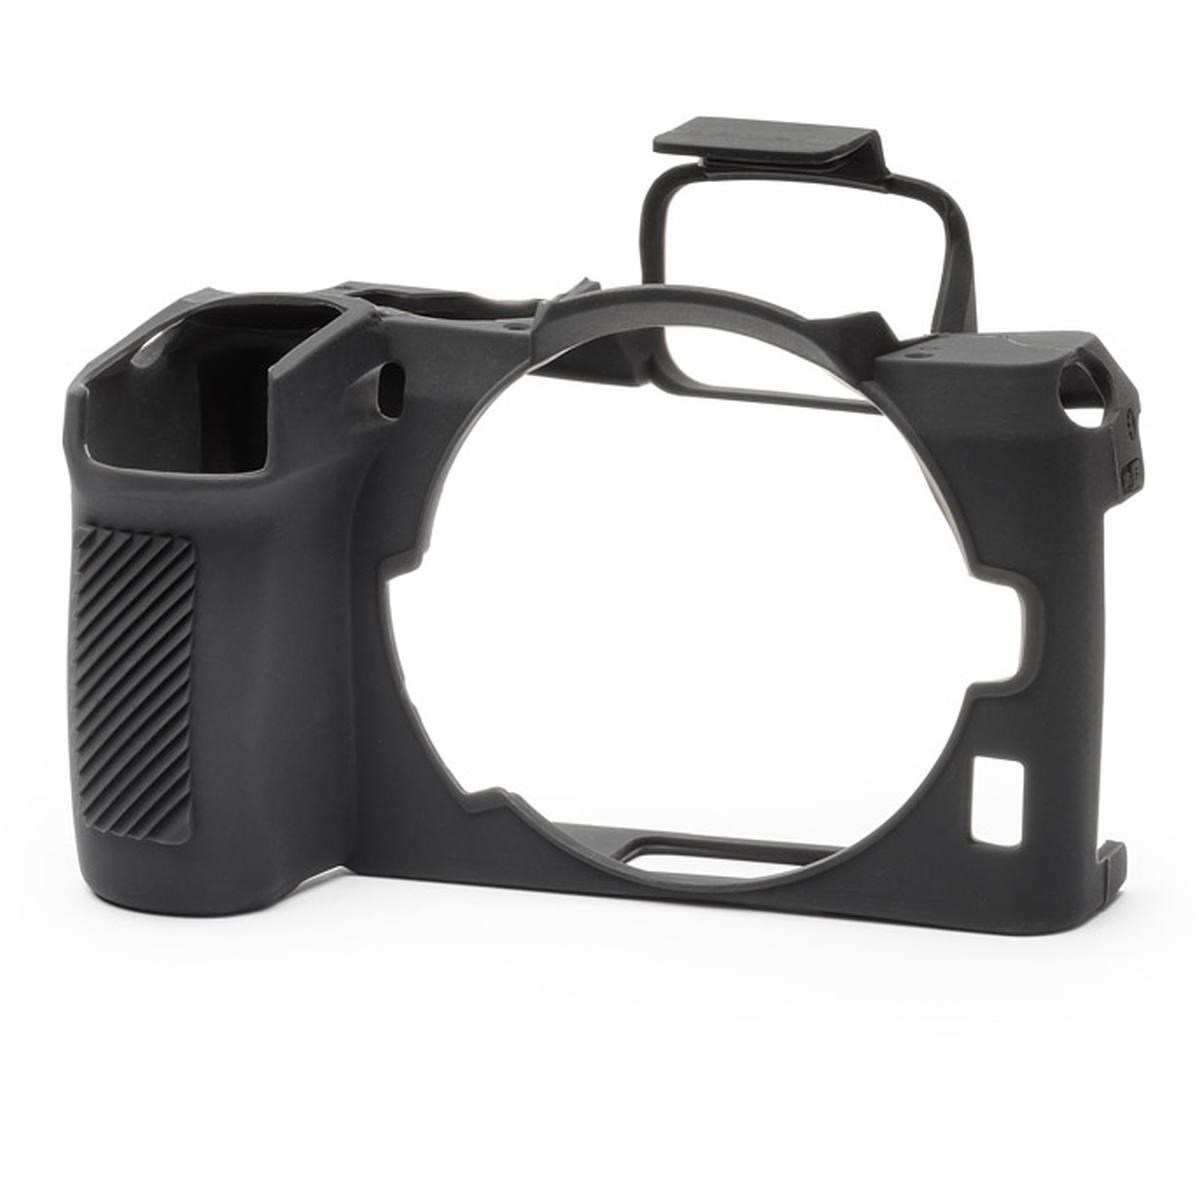 Walimex pro easyCover for Nikon Z50